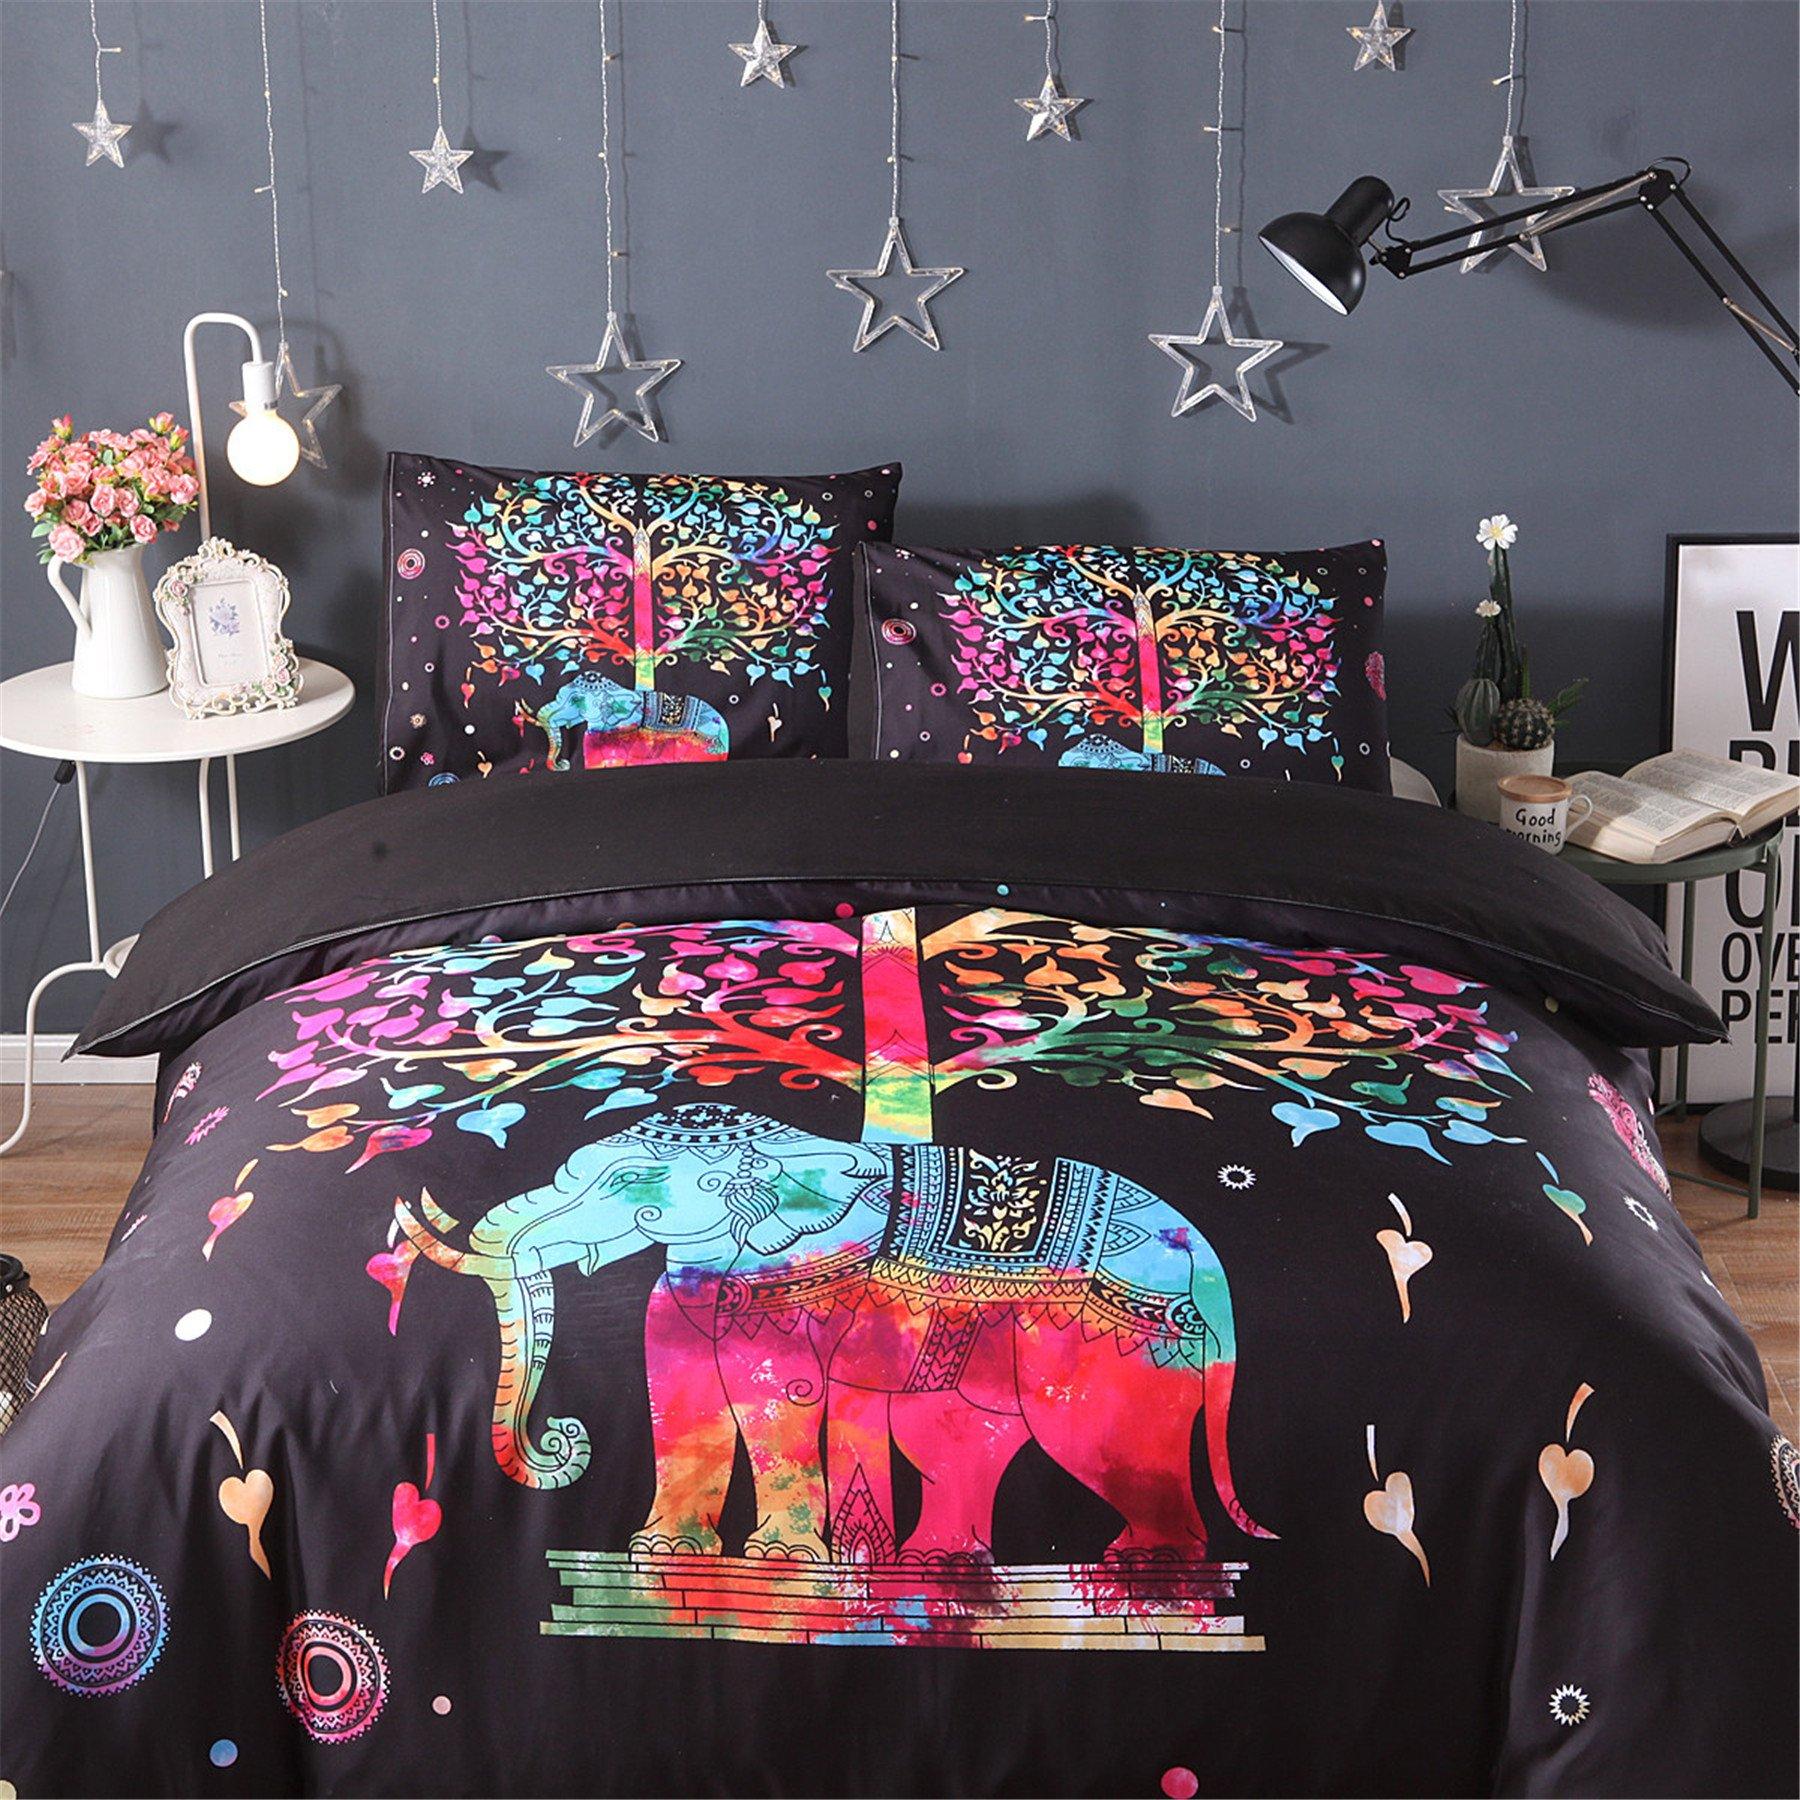 Meeting Story 3PCS Animals ELEPHANT Printed Duvet Cover Set, Microfiber Bedding Set (Queen, COLORFUL ELE)